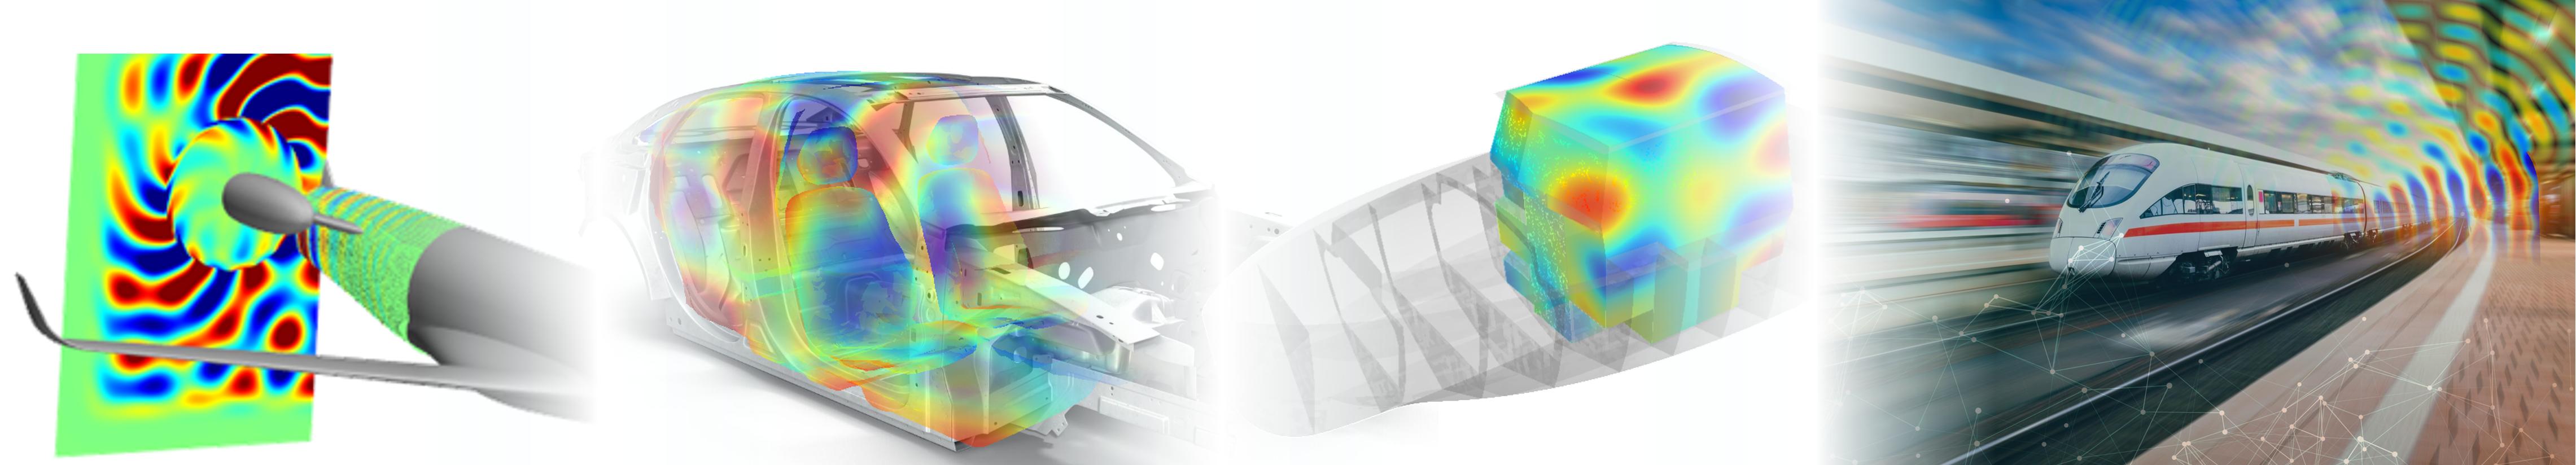 Actran acoustics engineering simulation